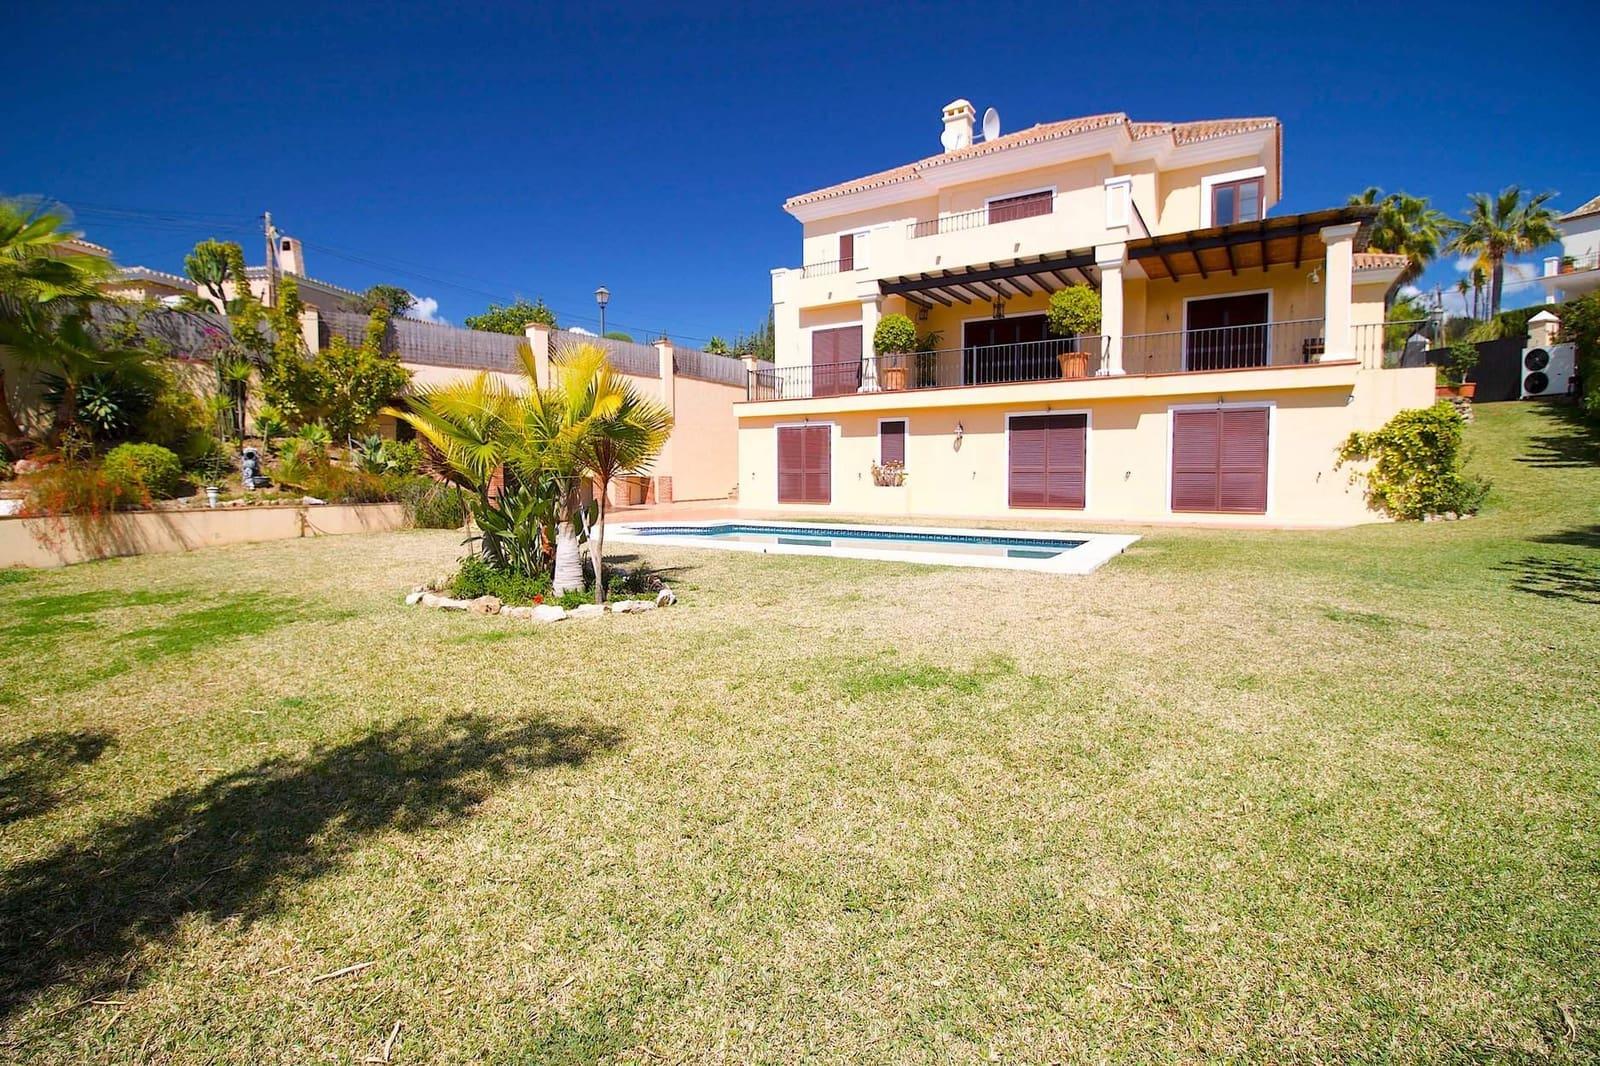 7 bedroom Villa for sale in Marbella - € 1,390,000 (Ref: 4283144)